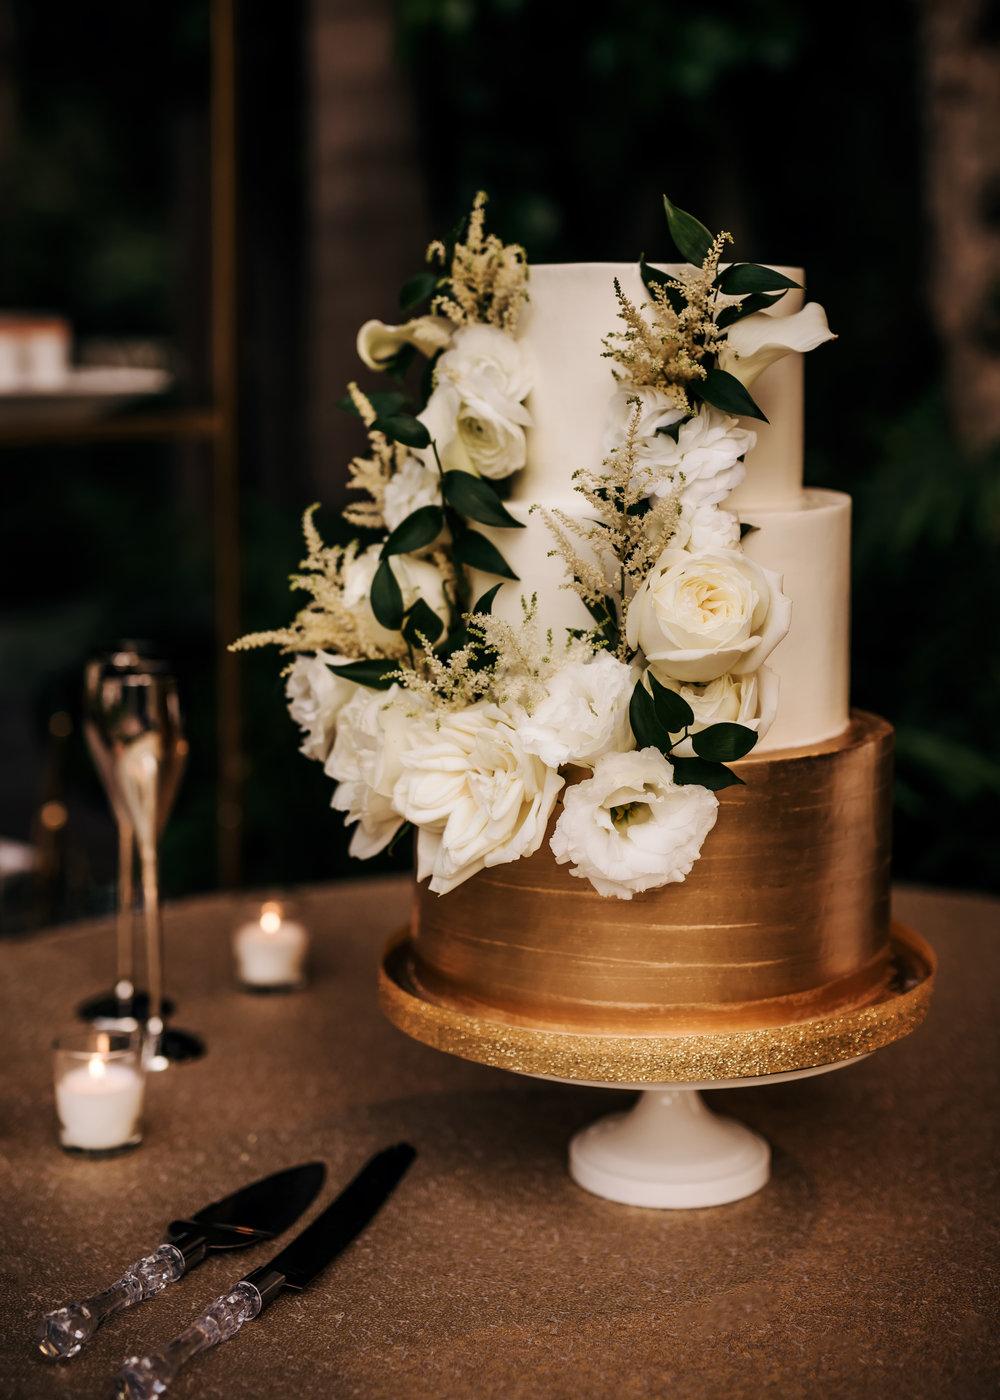 Turchin_20180825_Austinae-Brent-Wedding_449.jpg